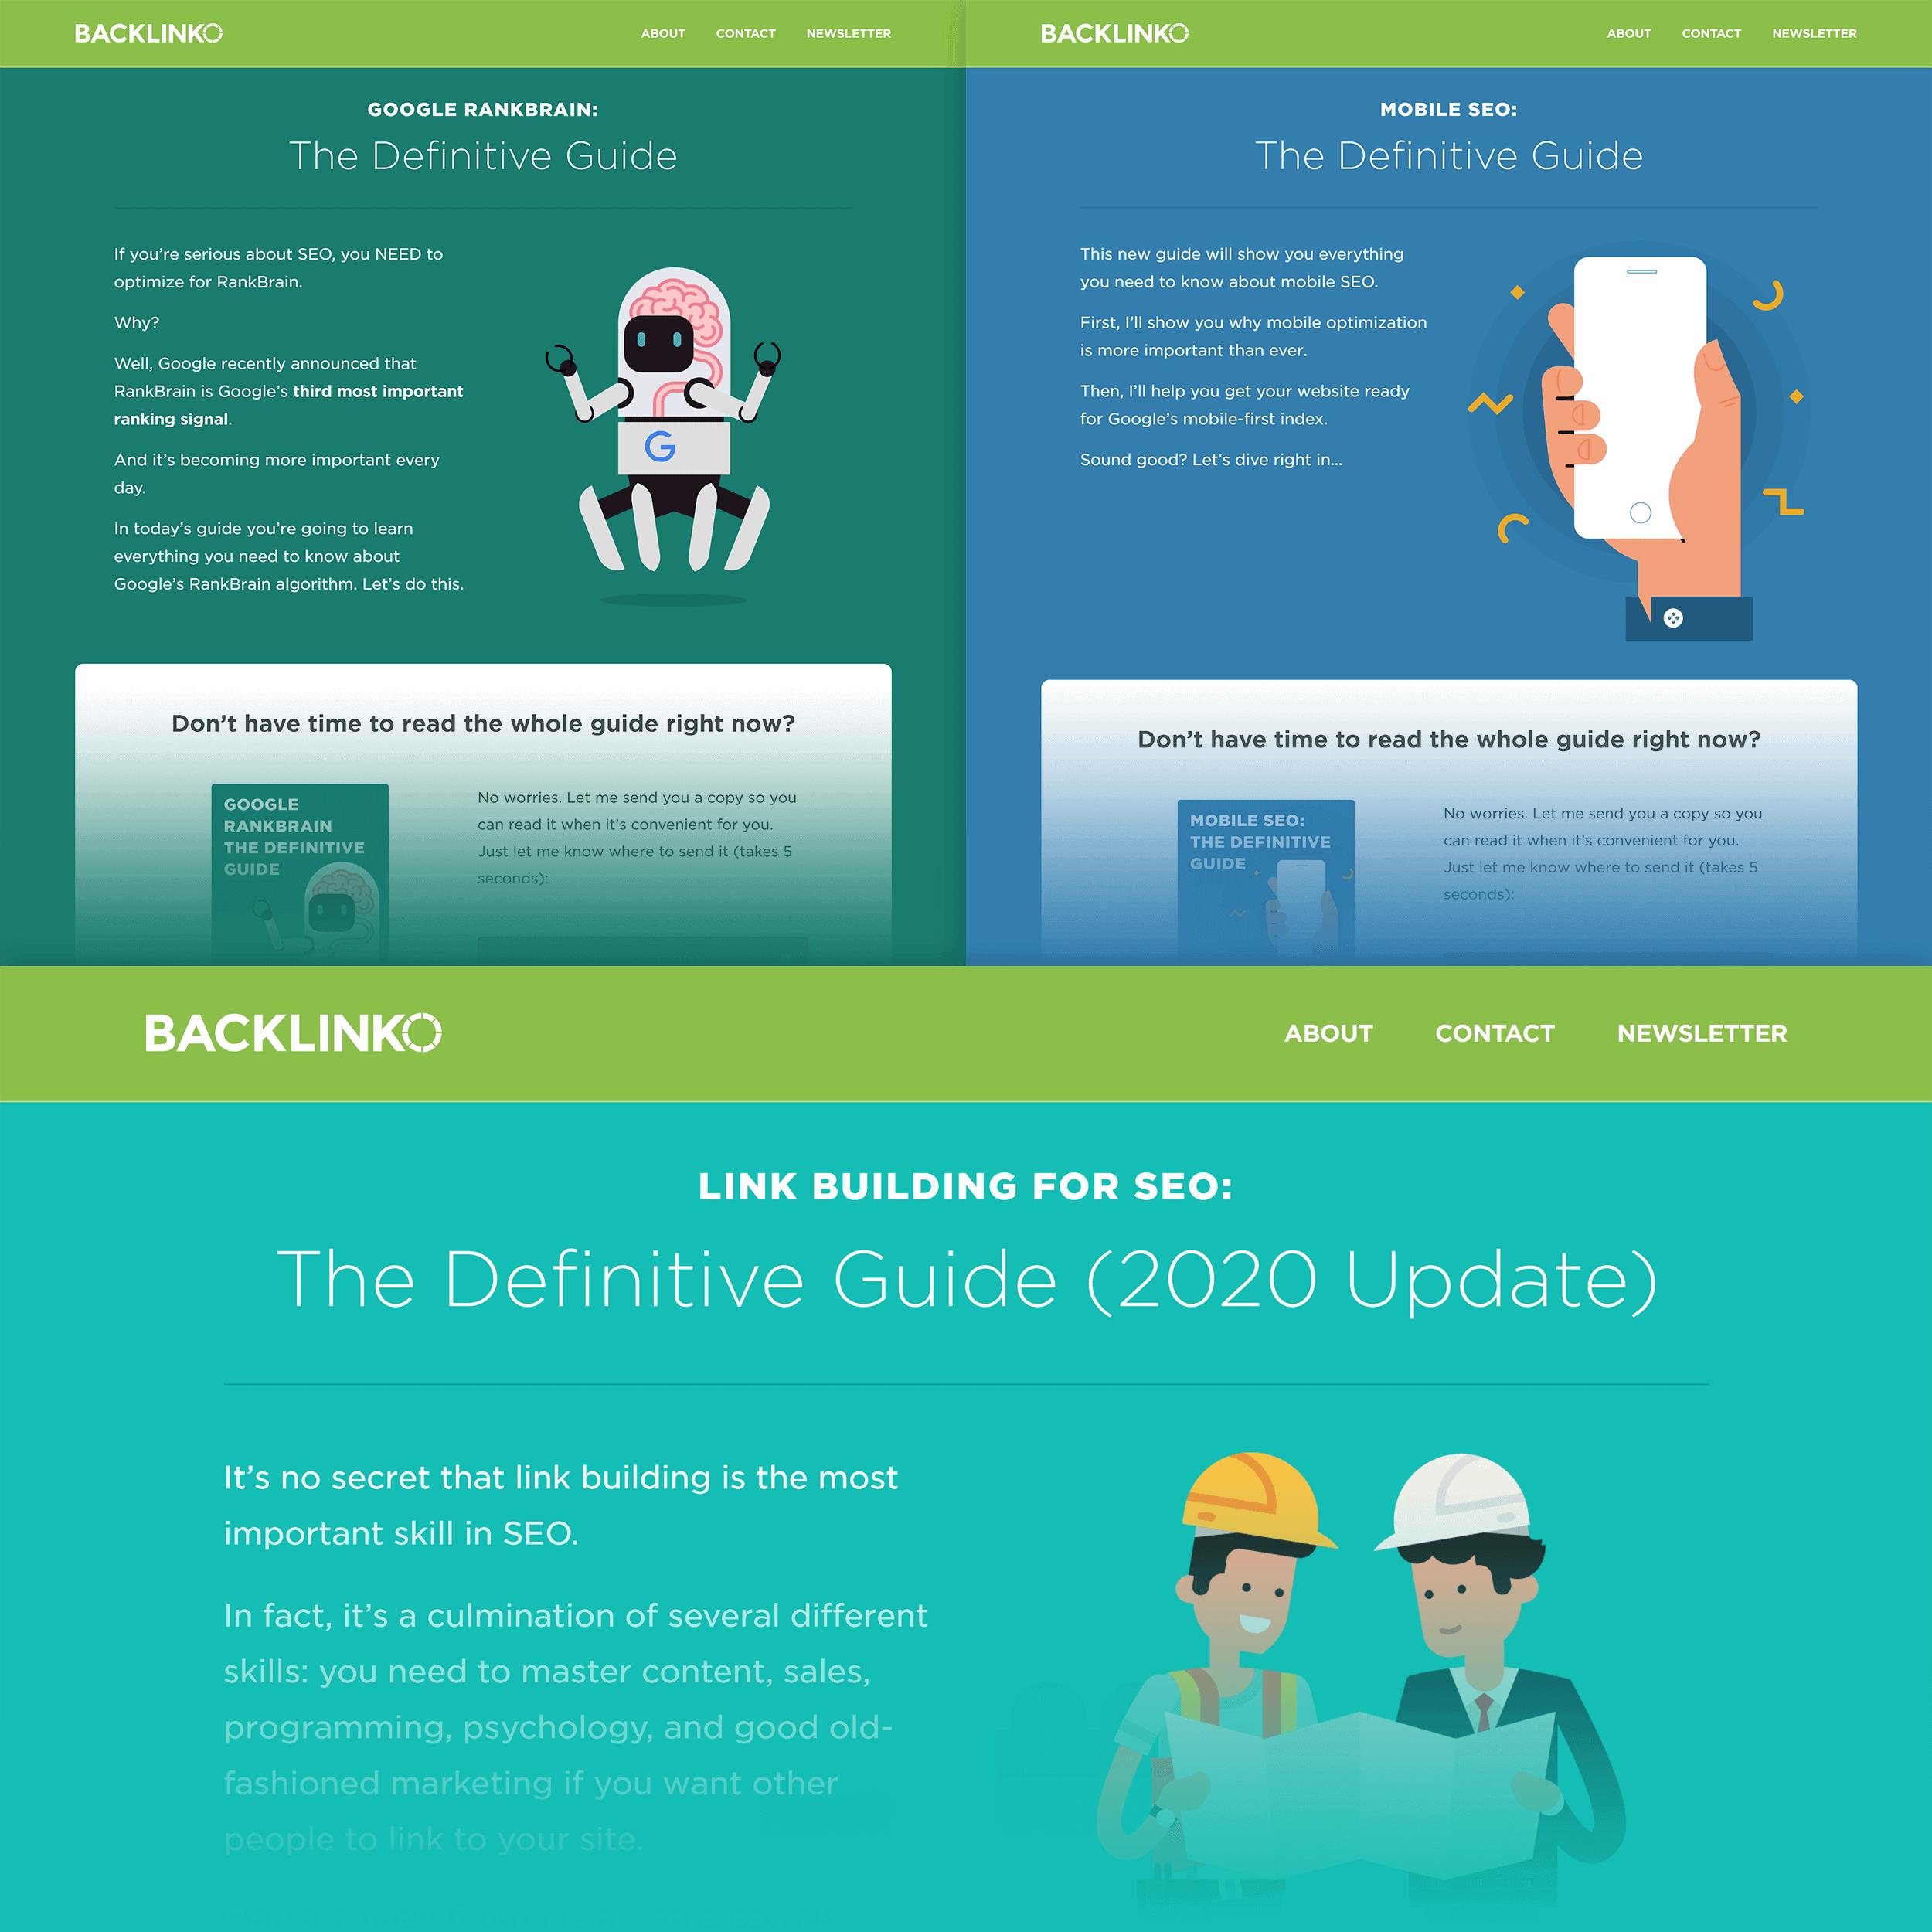 Backlinko Guides